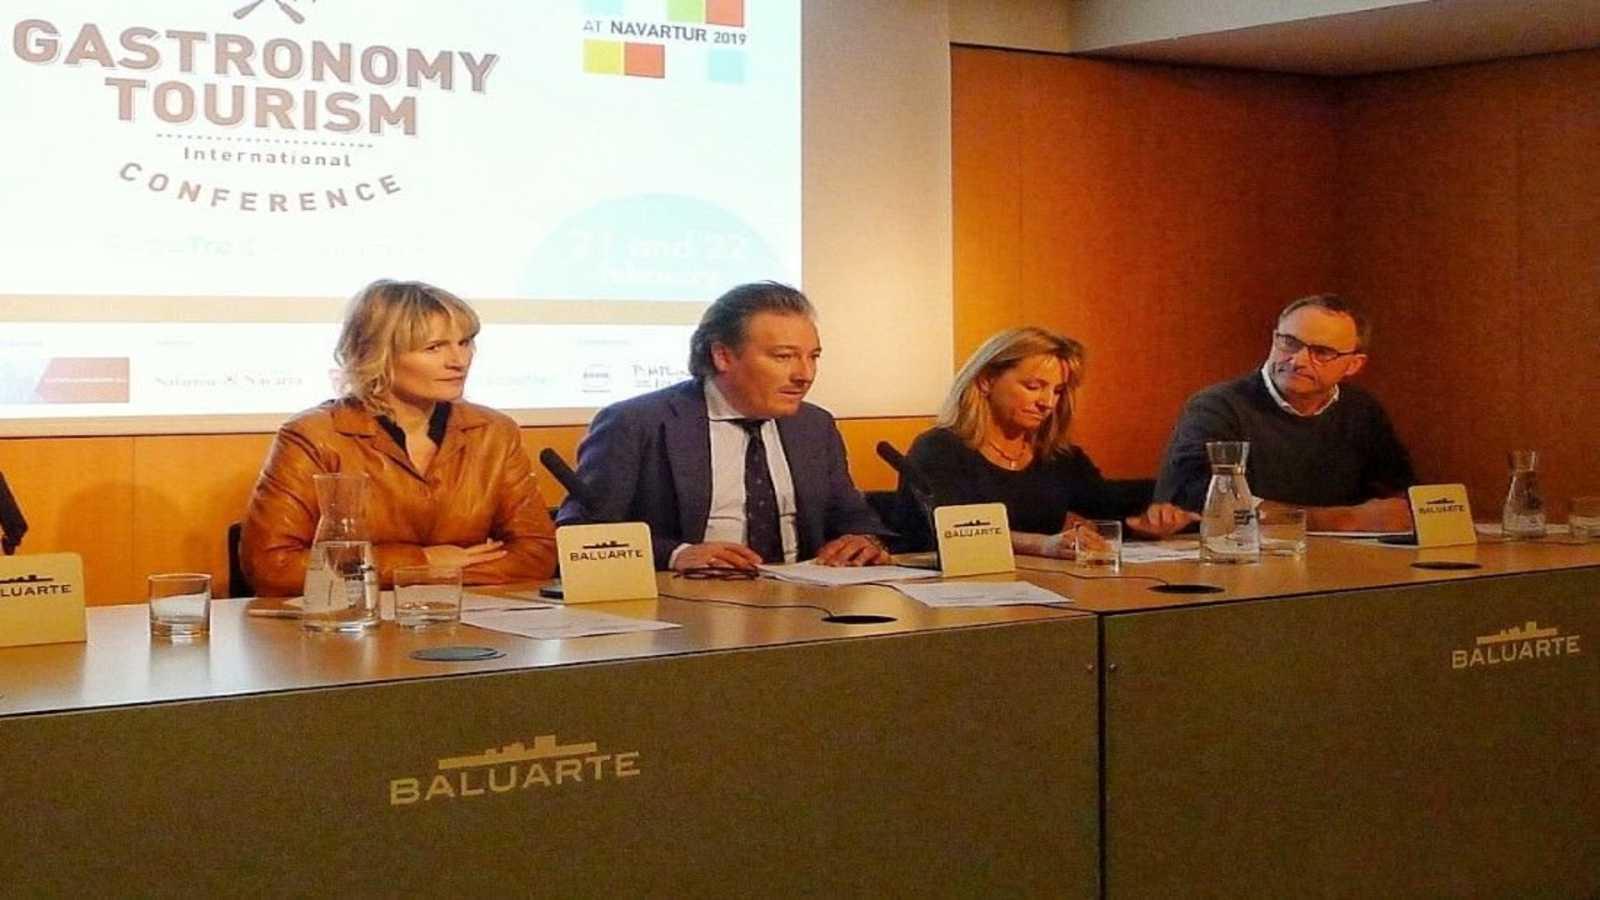 Degustar España - III Congreso Internacional de Turismo Gastronómico FoodTrex  - 22/02/20 - Escuchar ahora